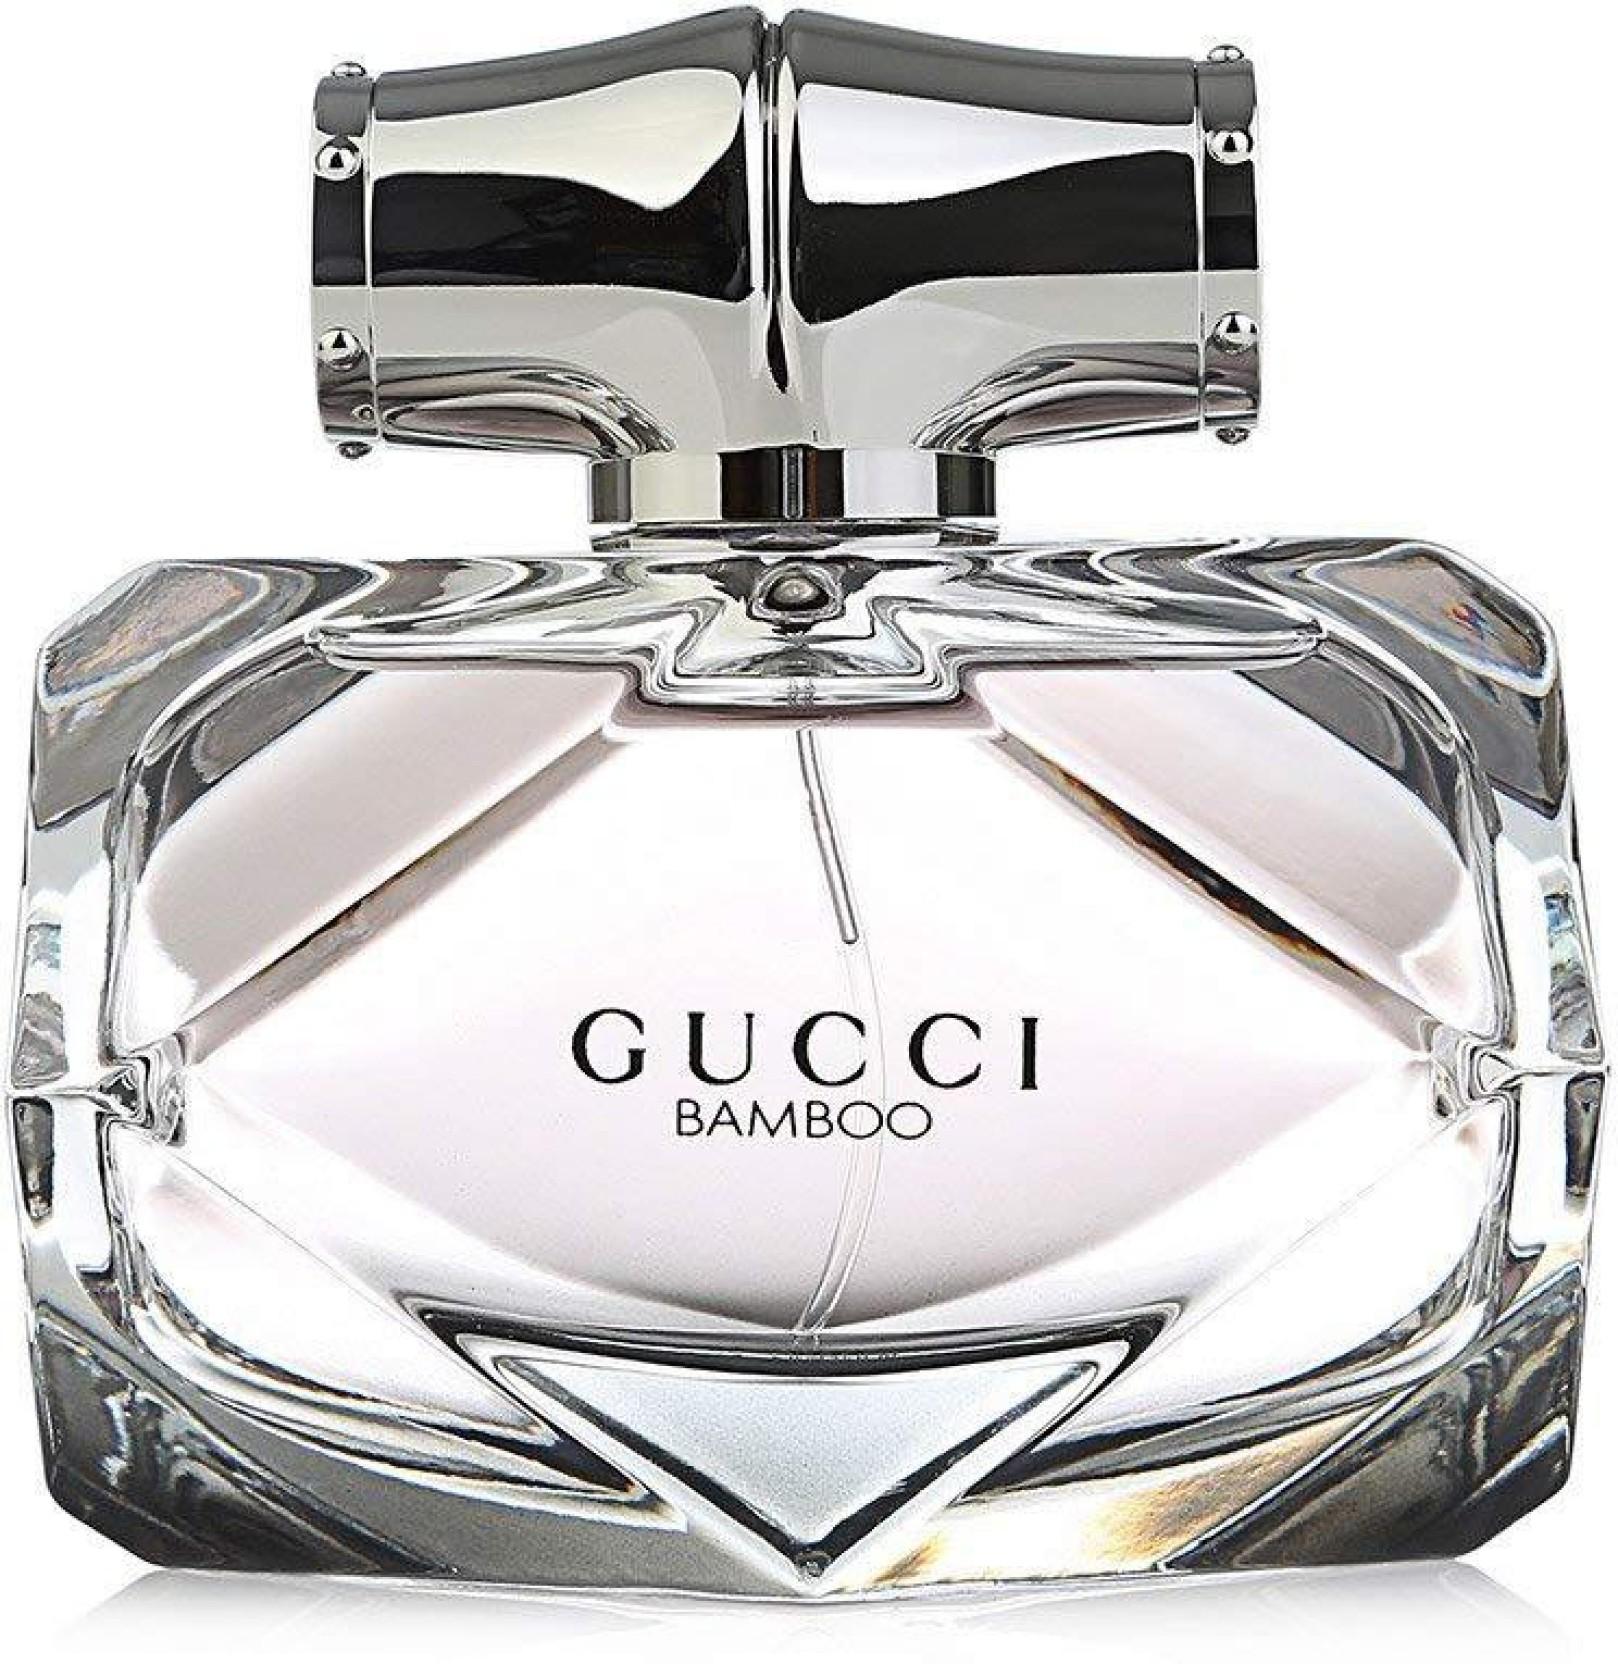 Buy Gucci Perfume Bamboo Limited Edition Eau De Parfum 75 Ml Edp 75ml Women For